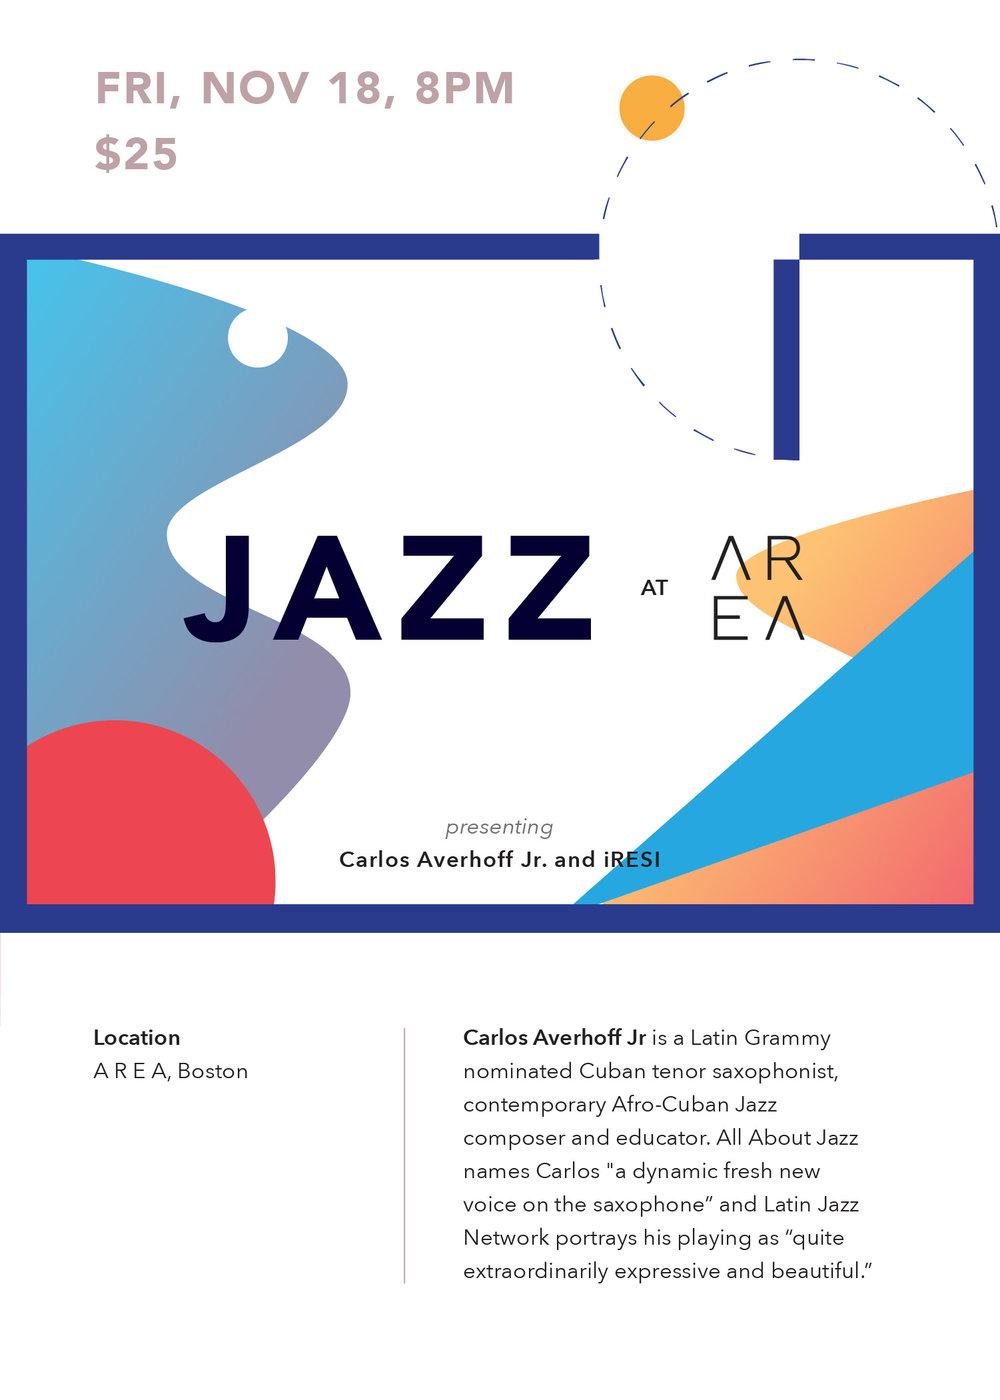 AREA_jazz.jpg